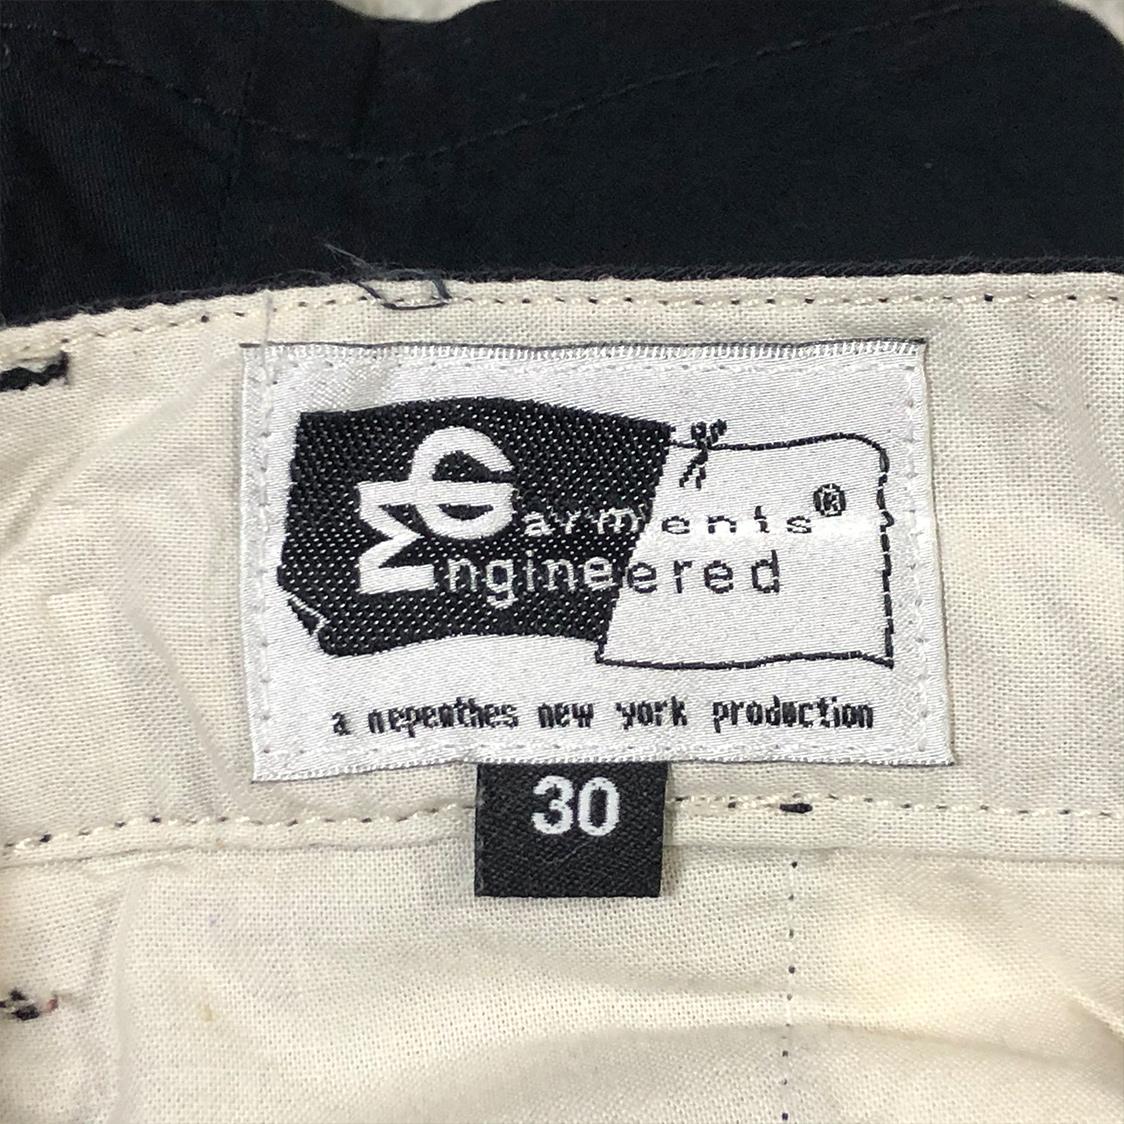 ENGINEERED GARMENTS エンジニアドガーメンツ 【サイズ30】 ショーツ ネイビー ハーフパンツ ショートパンツ